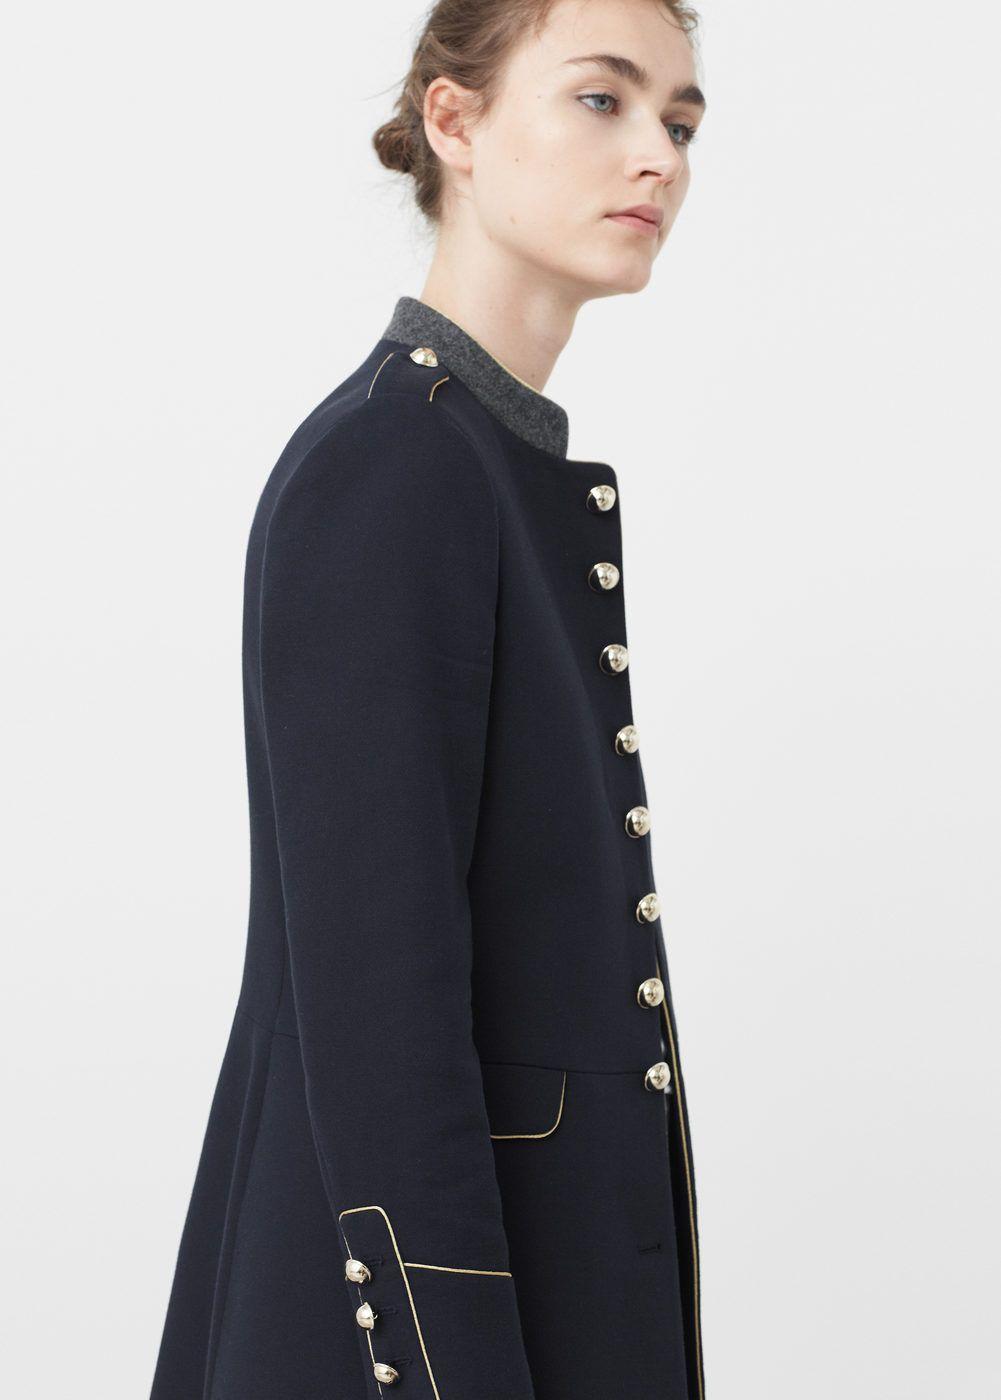 Abrigo Mujer 2019 Femme Militar Estilo Style En TZwT7U